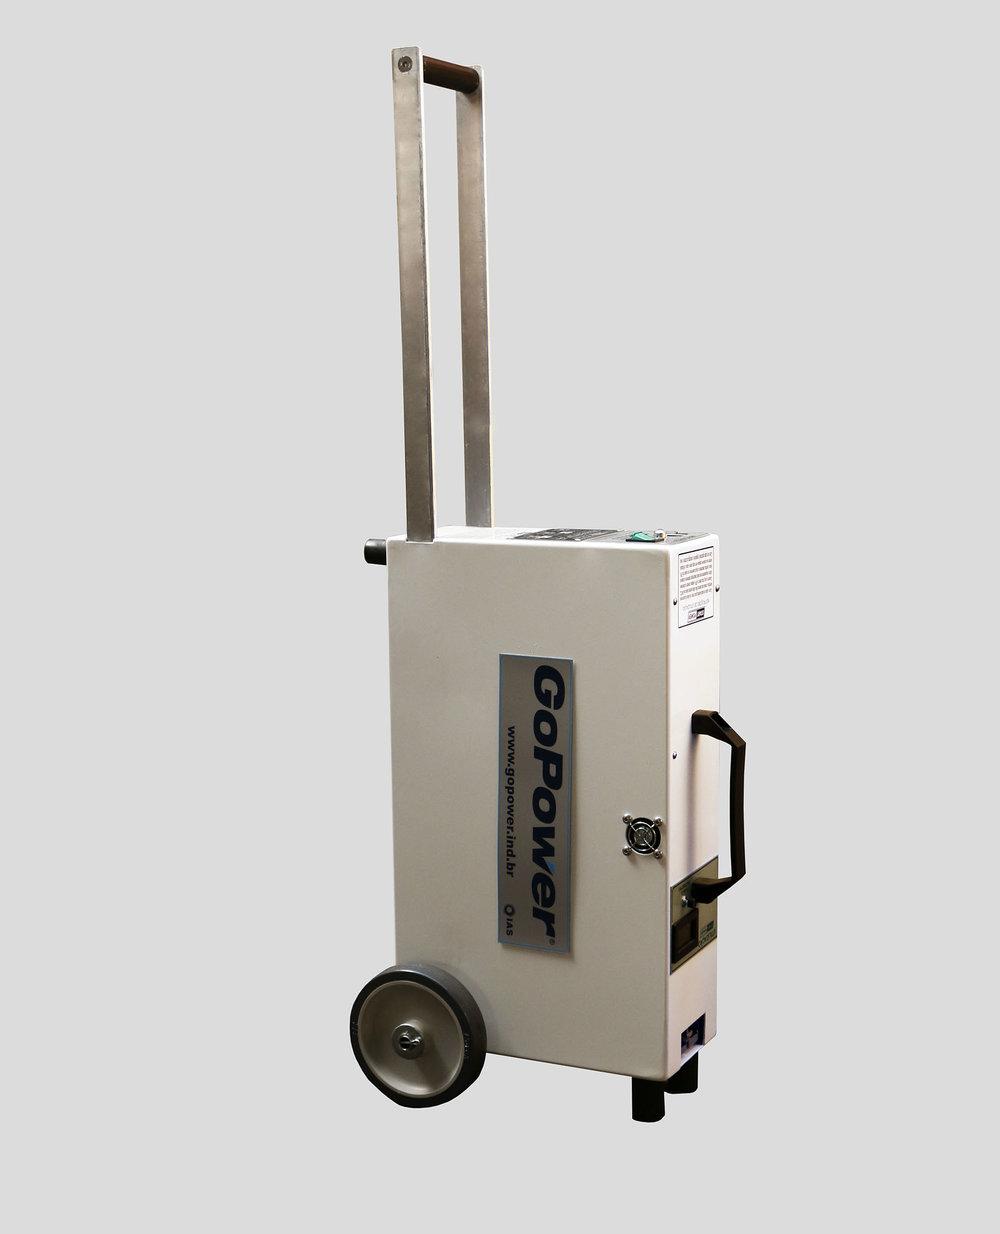 GoPower II 1500 - Portable (3).jpg